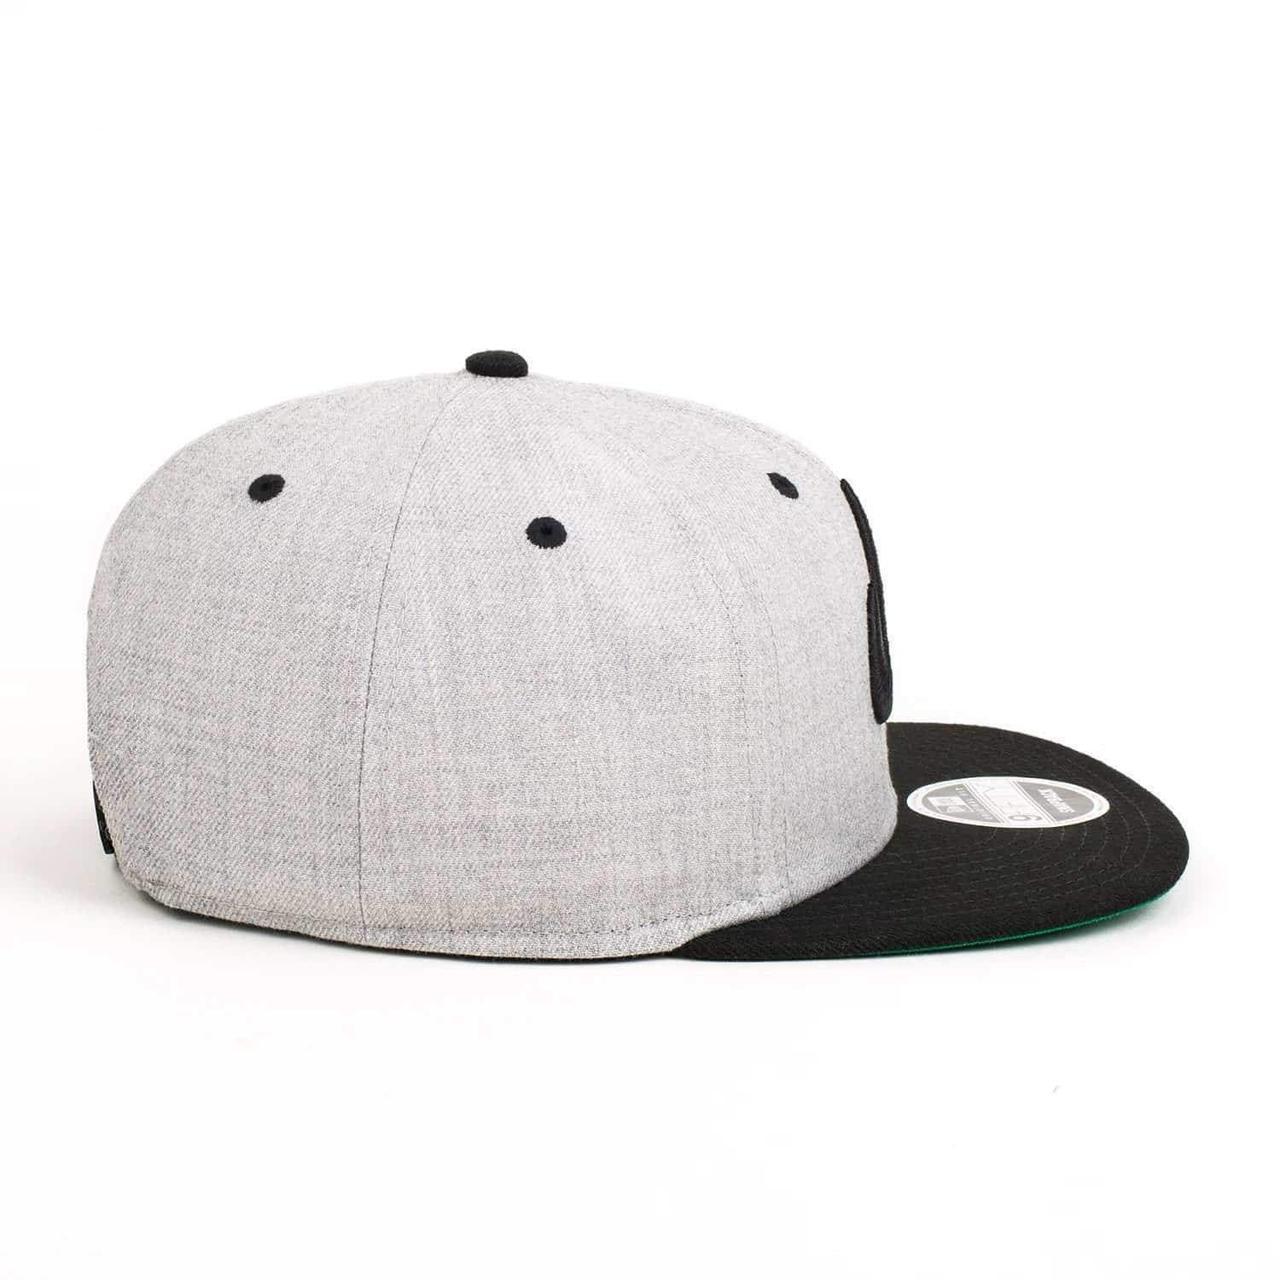 Dude Perfect DP x New Era 9Fifty Snapback    Gray + Black 5d131eabbf7